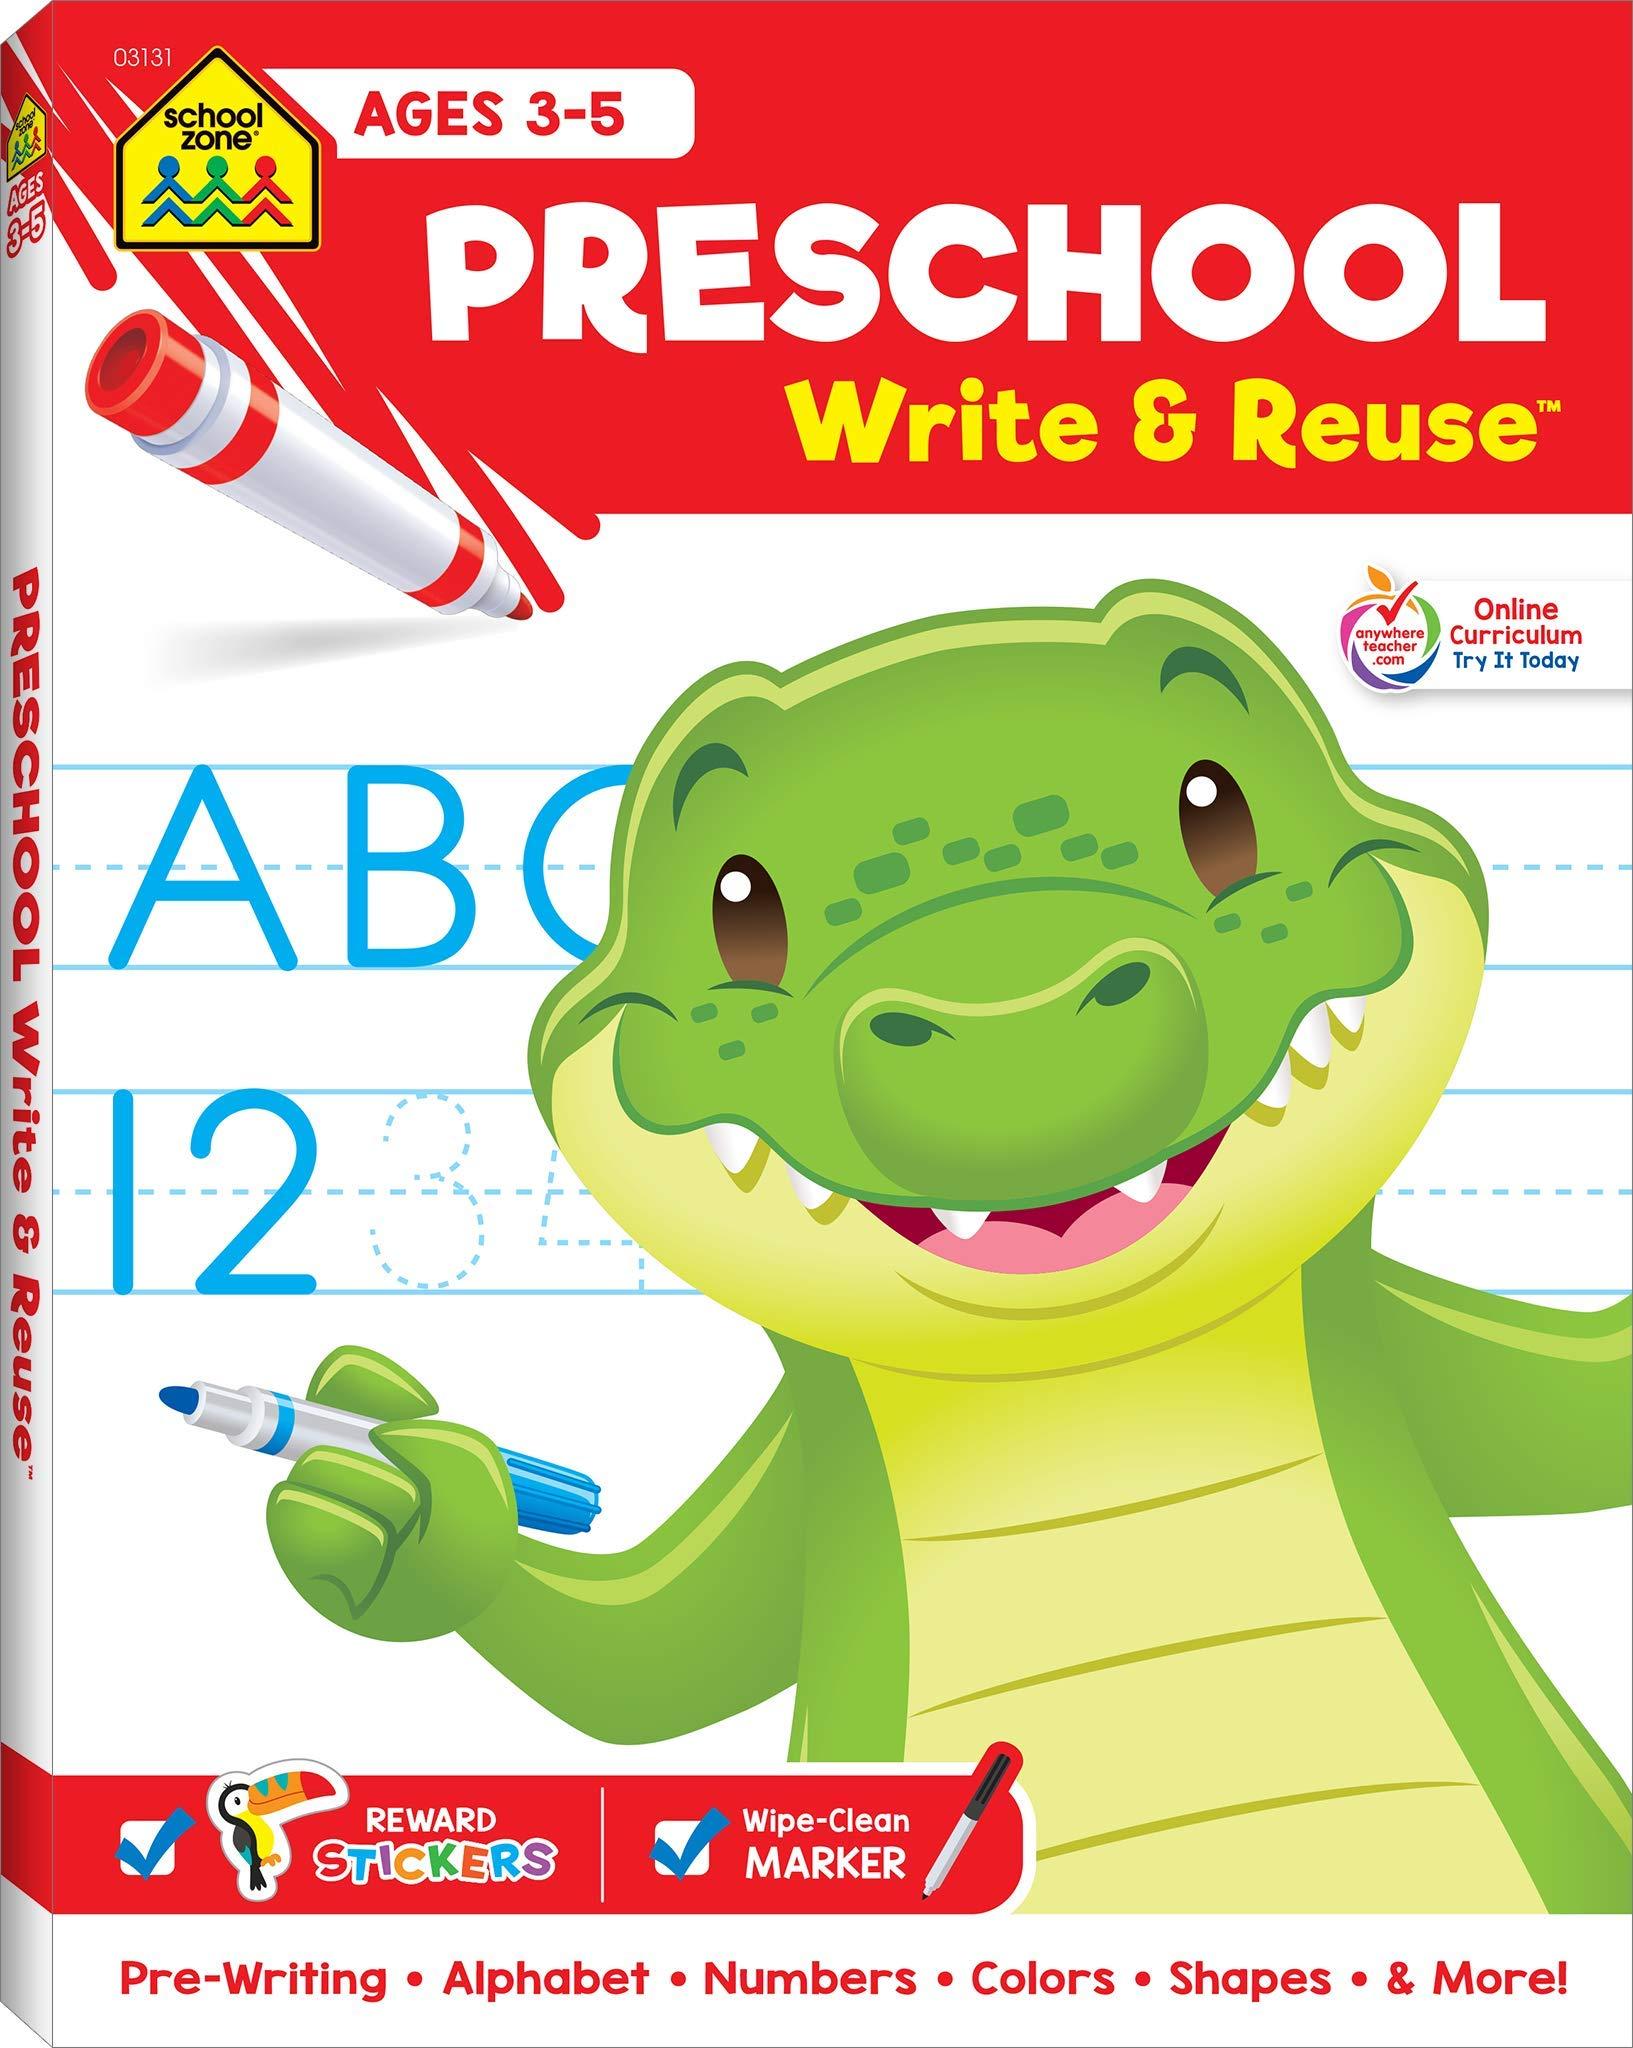 School Zone Preschool Uppercase Lowercase product image